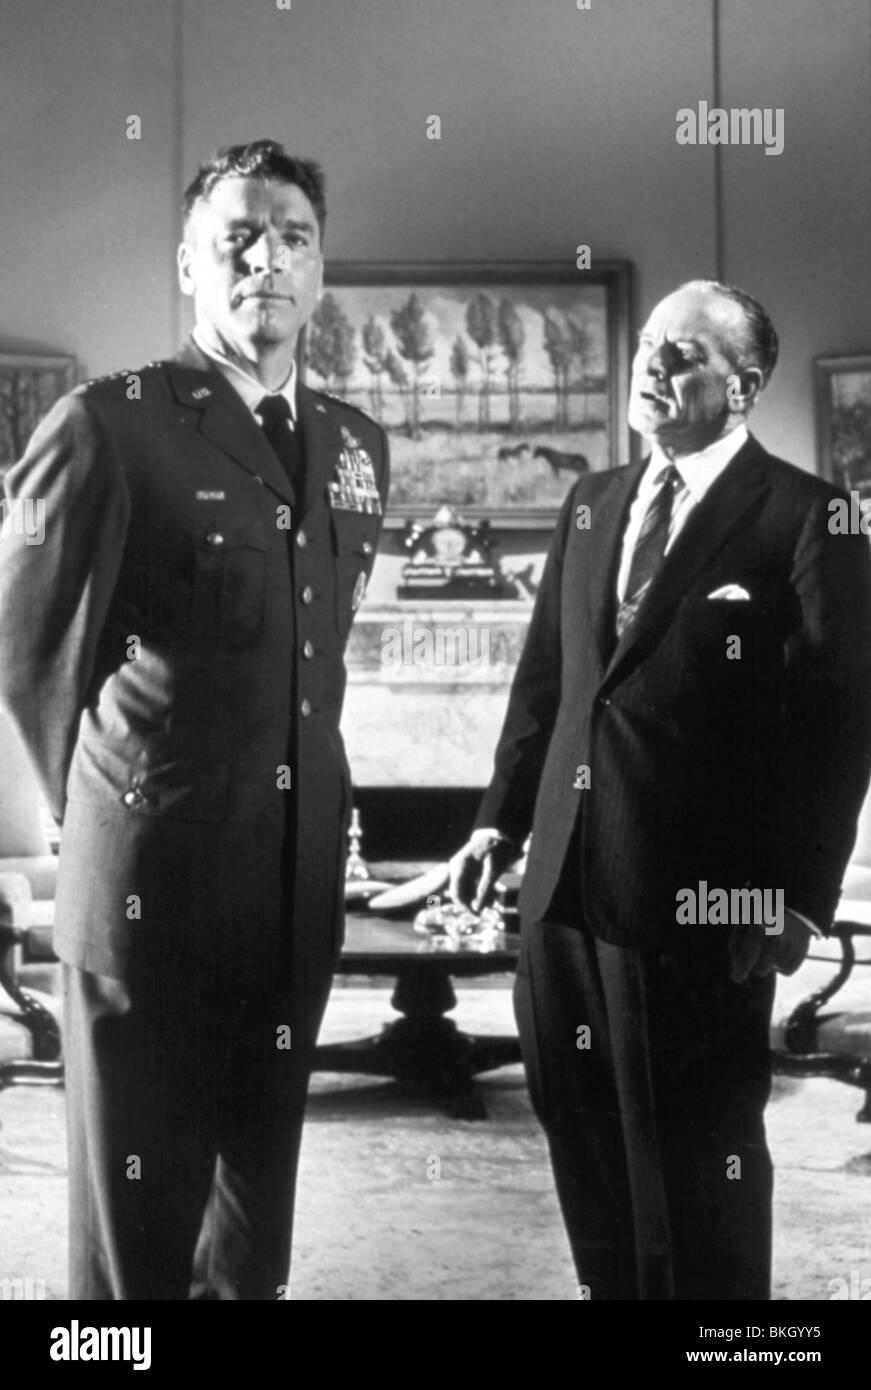 SEVEN DAYS IN MAY (1964) 7 DAYS IN MAY (ALT) BURT LANCASTER, FREDRIC MARCH, JOHN FRANKENHEIMER (DIR) SDMY 002 - Stock Image